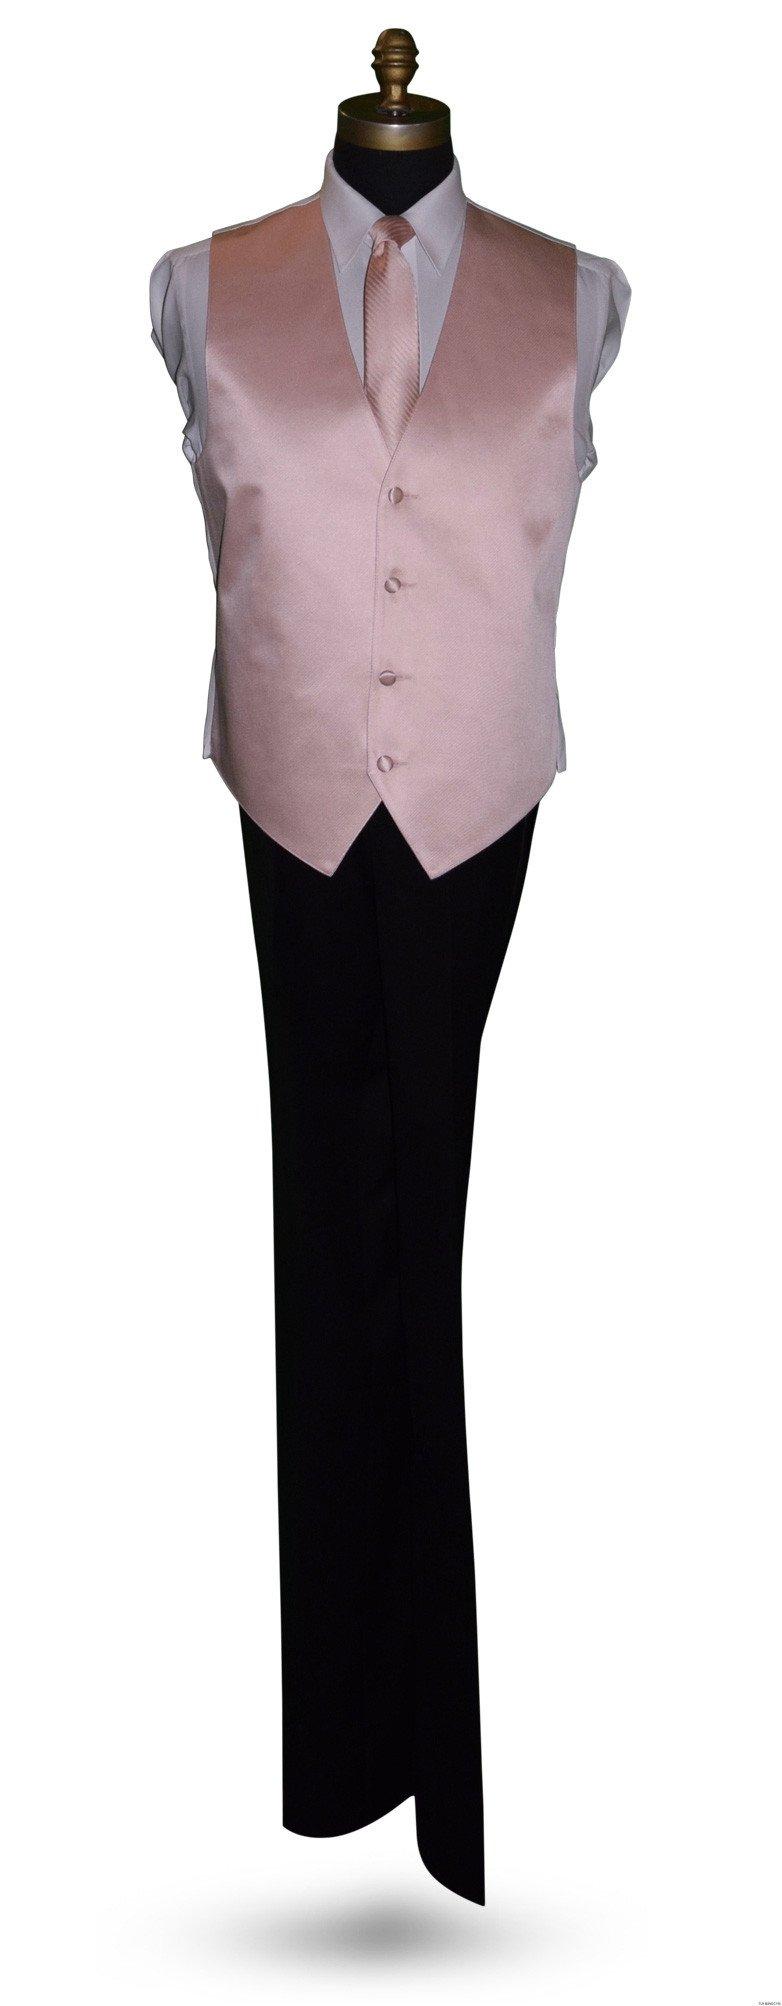 blush tuxedo vest with long blush dress tie, men and boys